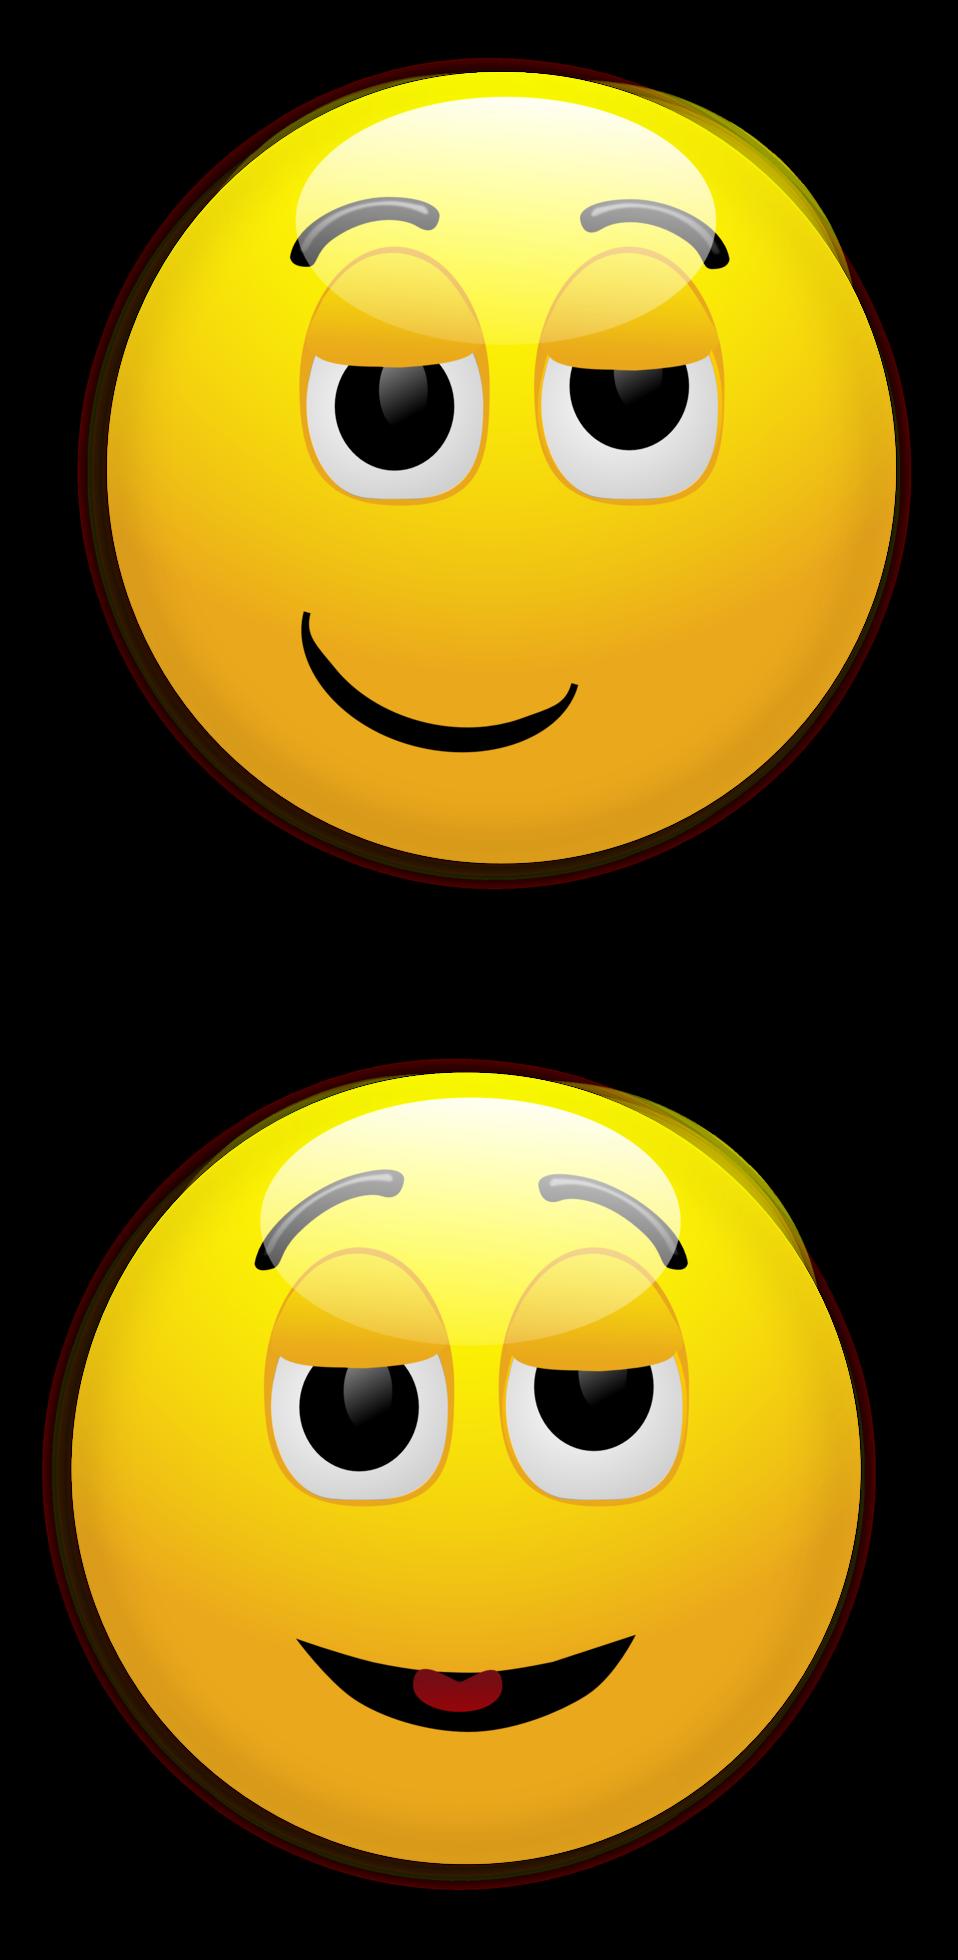 Smiley 4